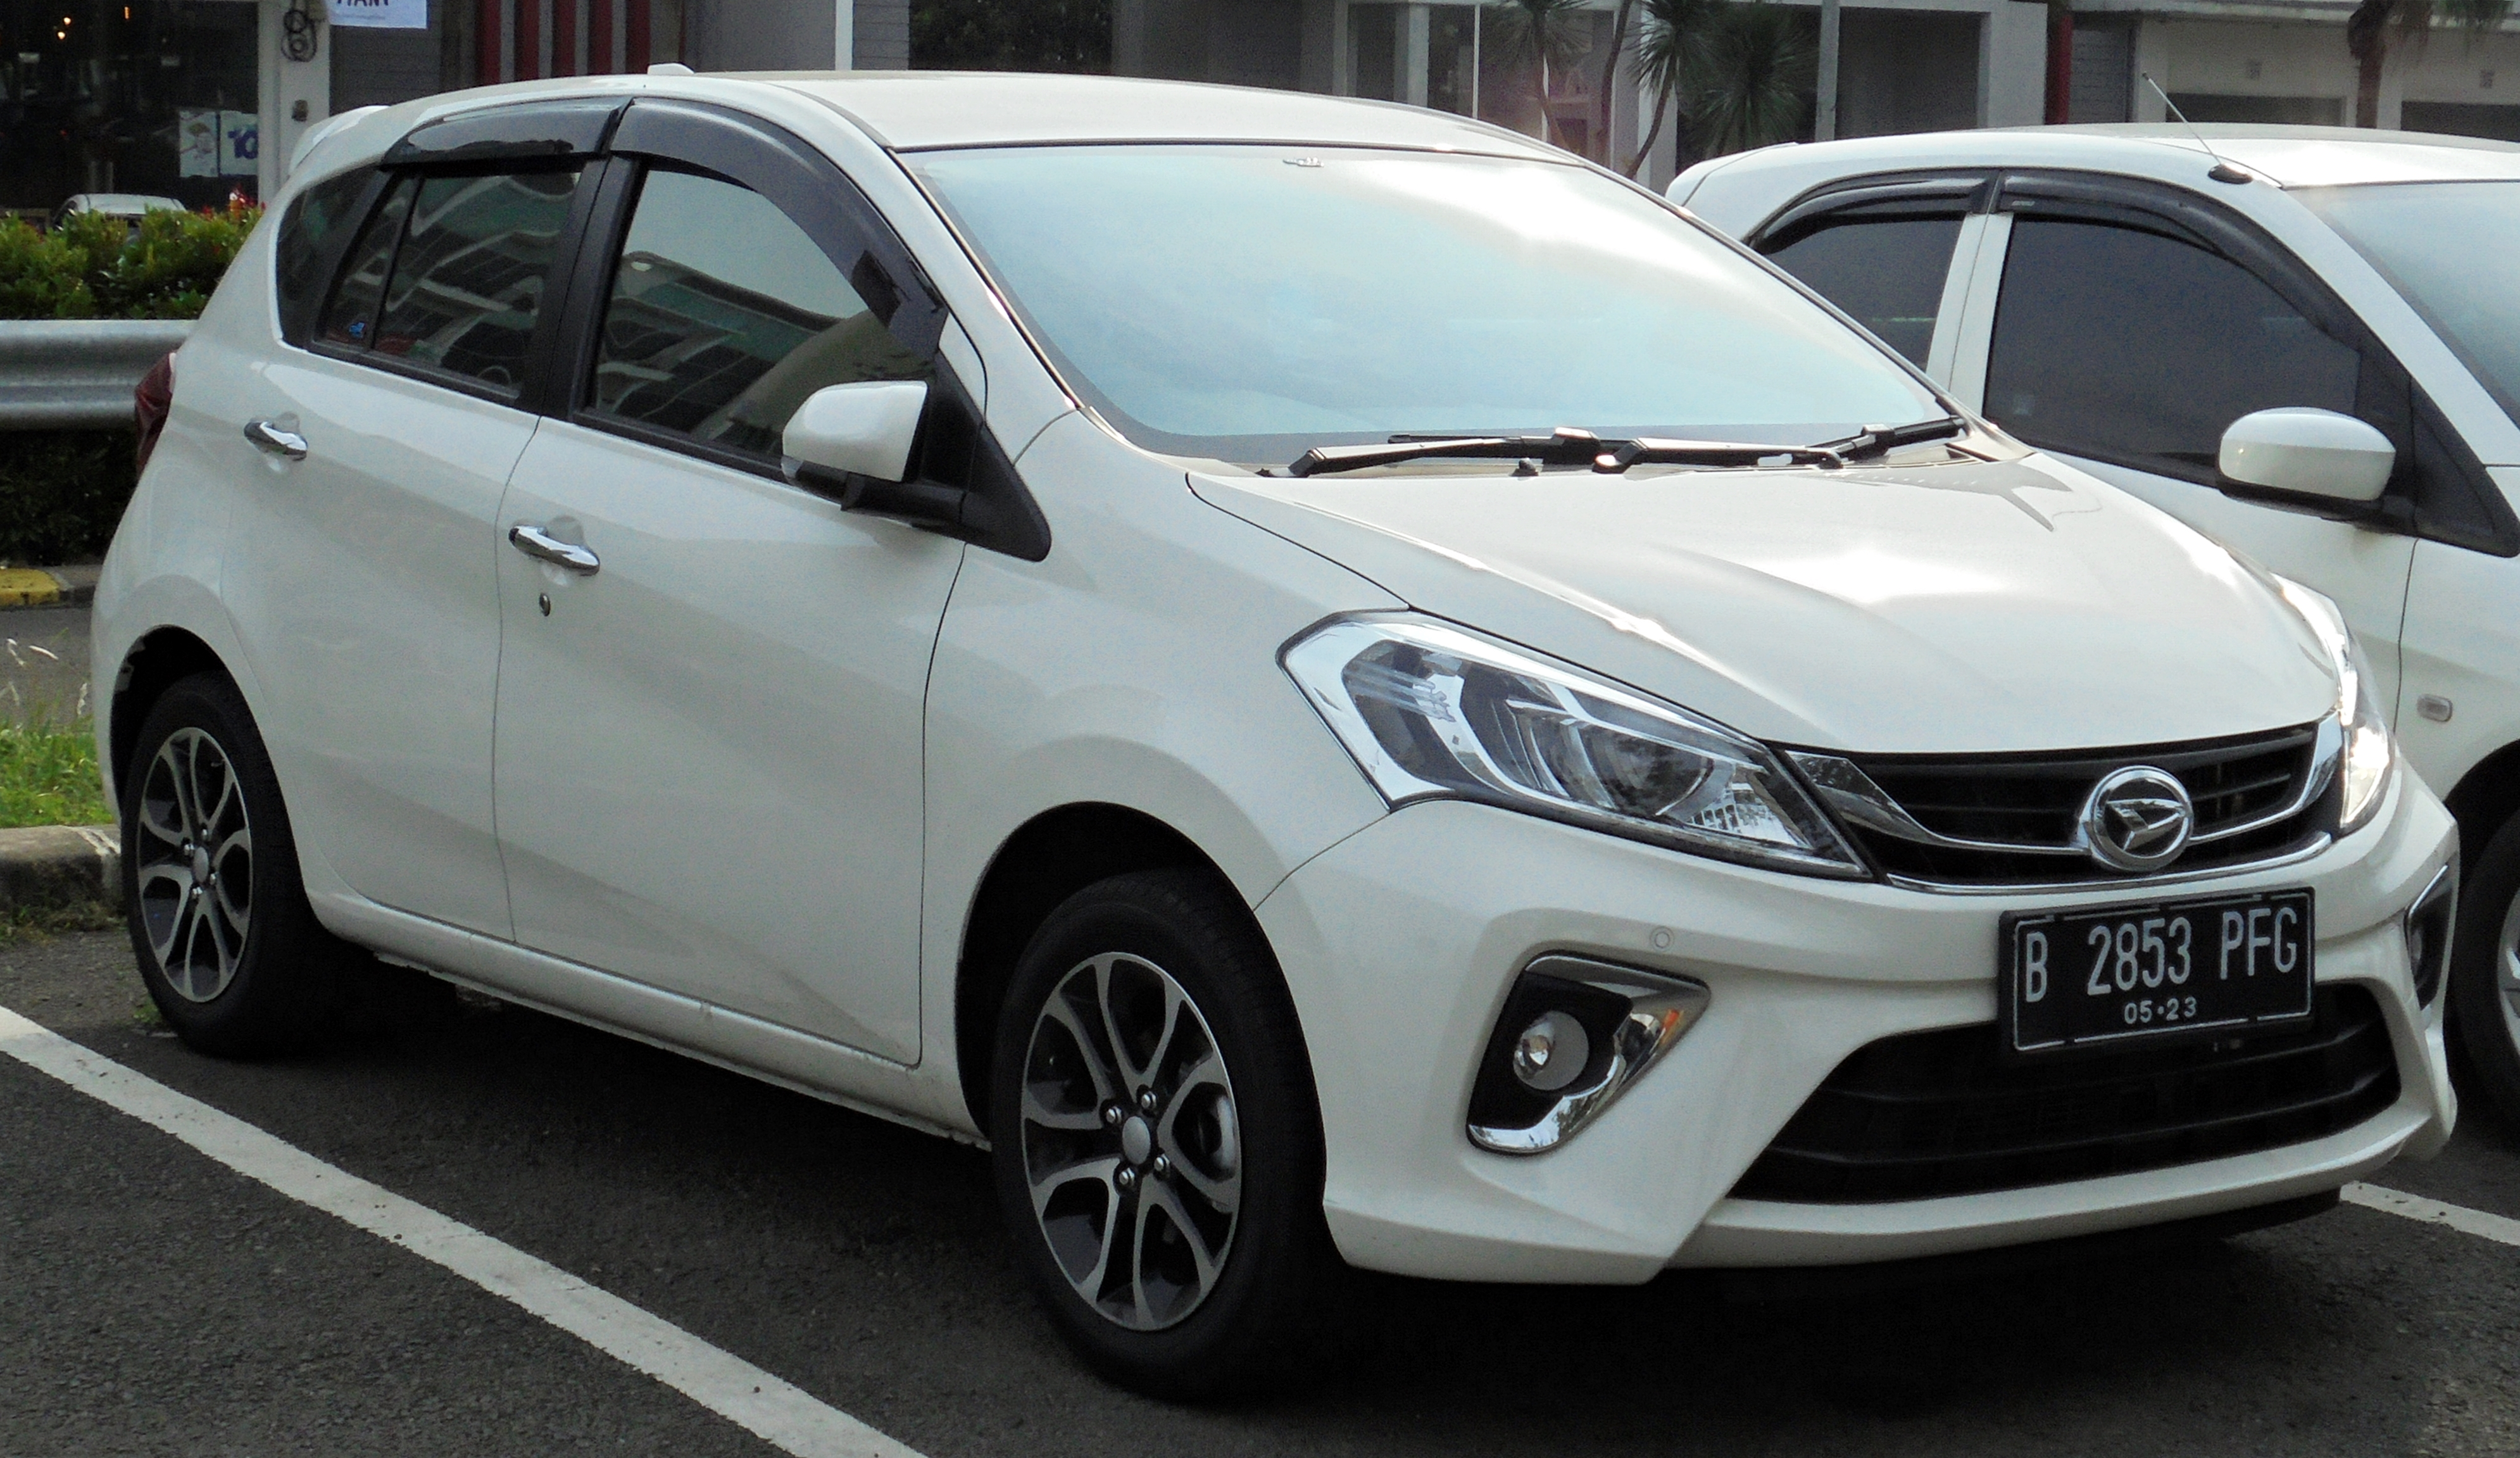 File:2018 Daihatsu Sirion 1 3 hatchback (M804RS